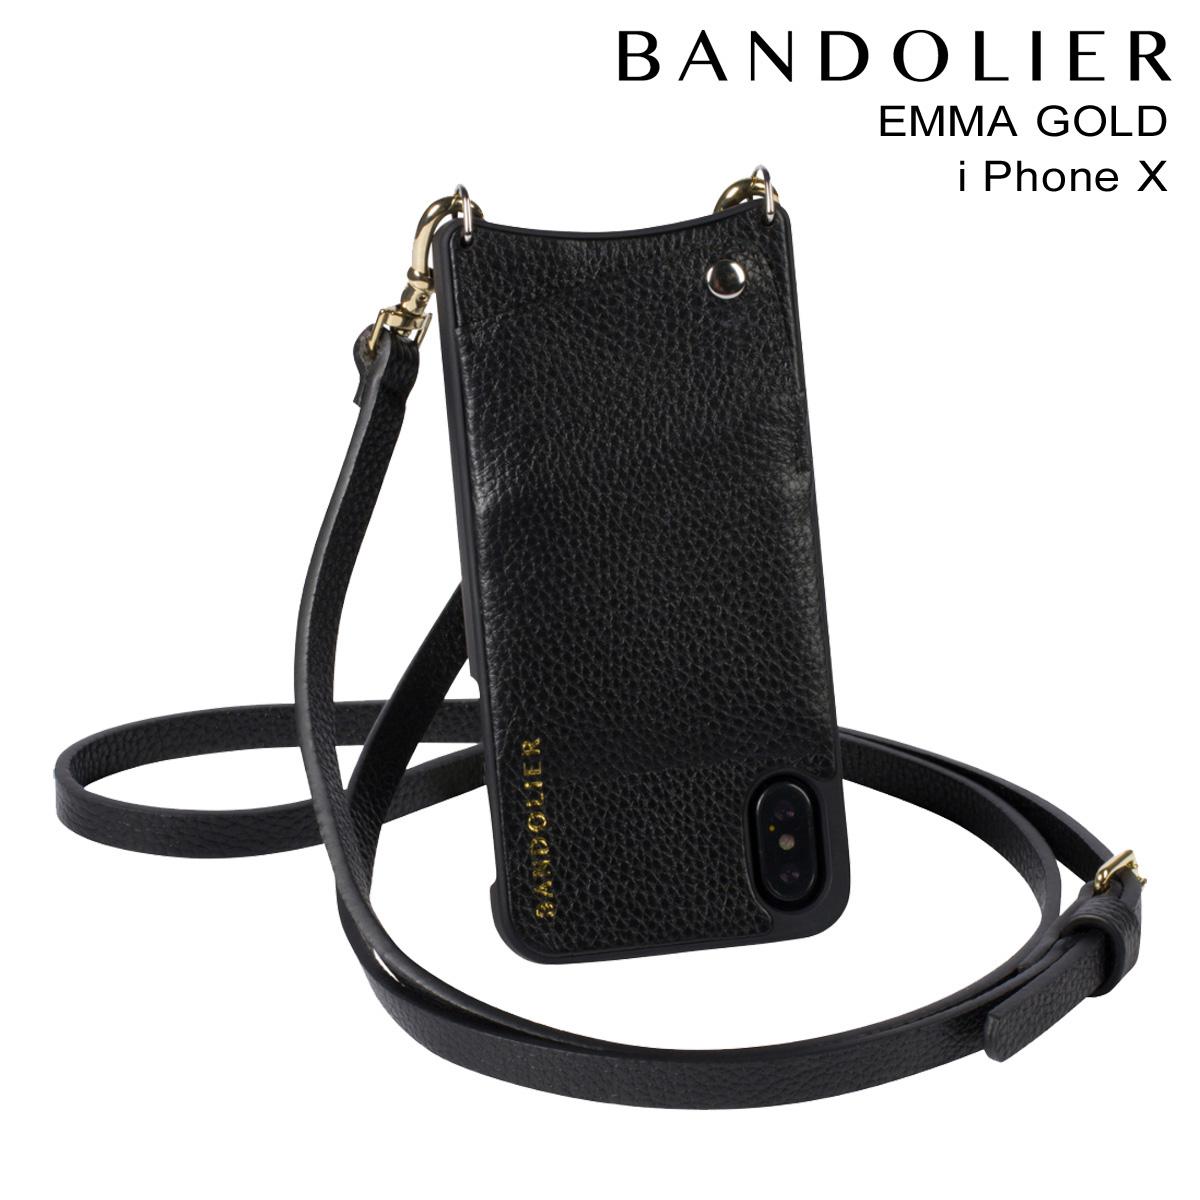 BANDOLIER EMMA GOLD バンドリヤー iPhoneX ケース スマホ アイフォン レザー メンズ レディース